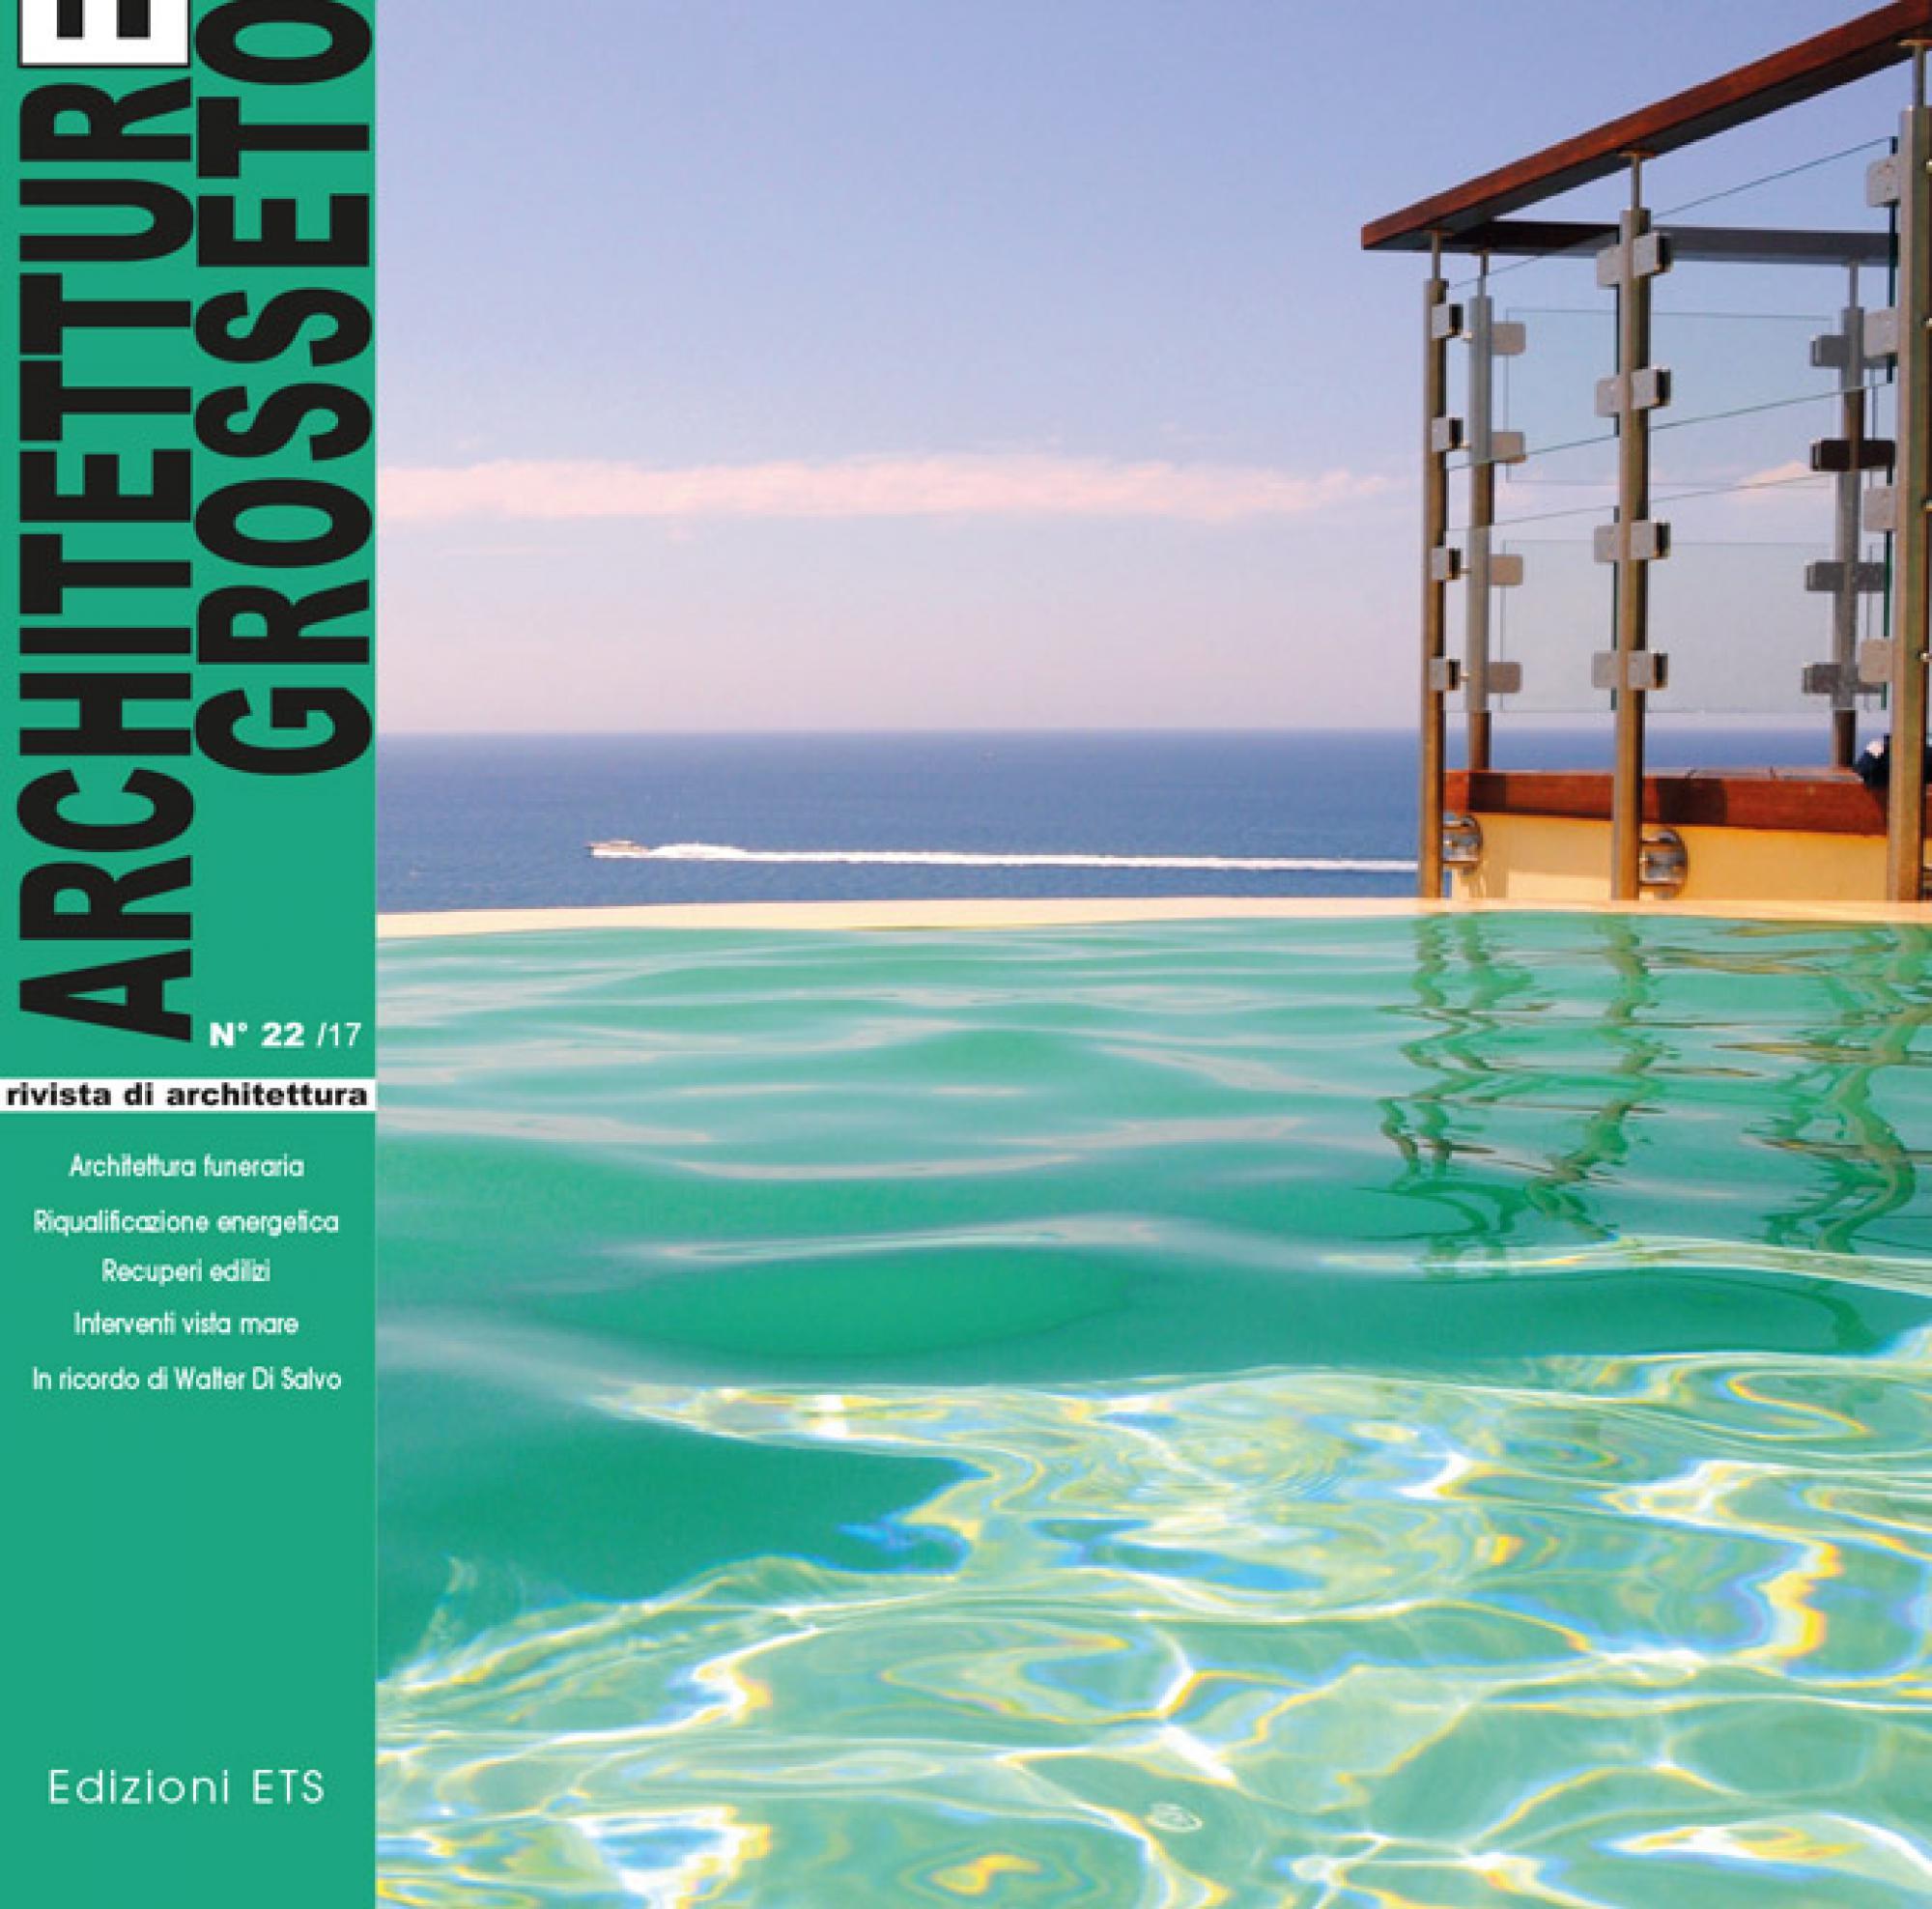 Architetture Grosseto 22/17